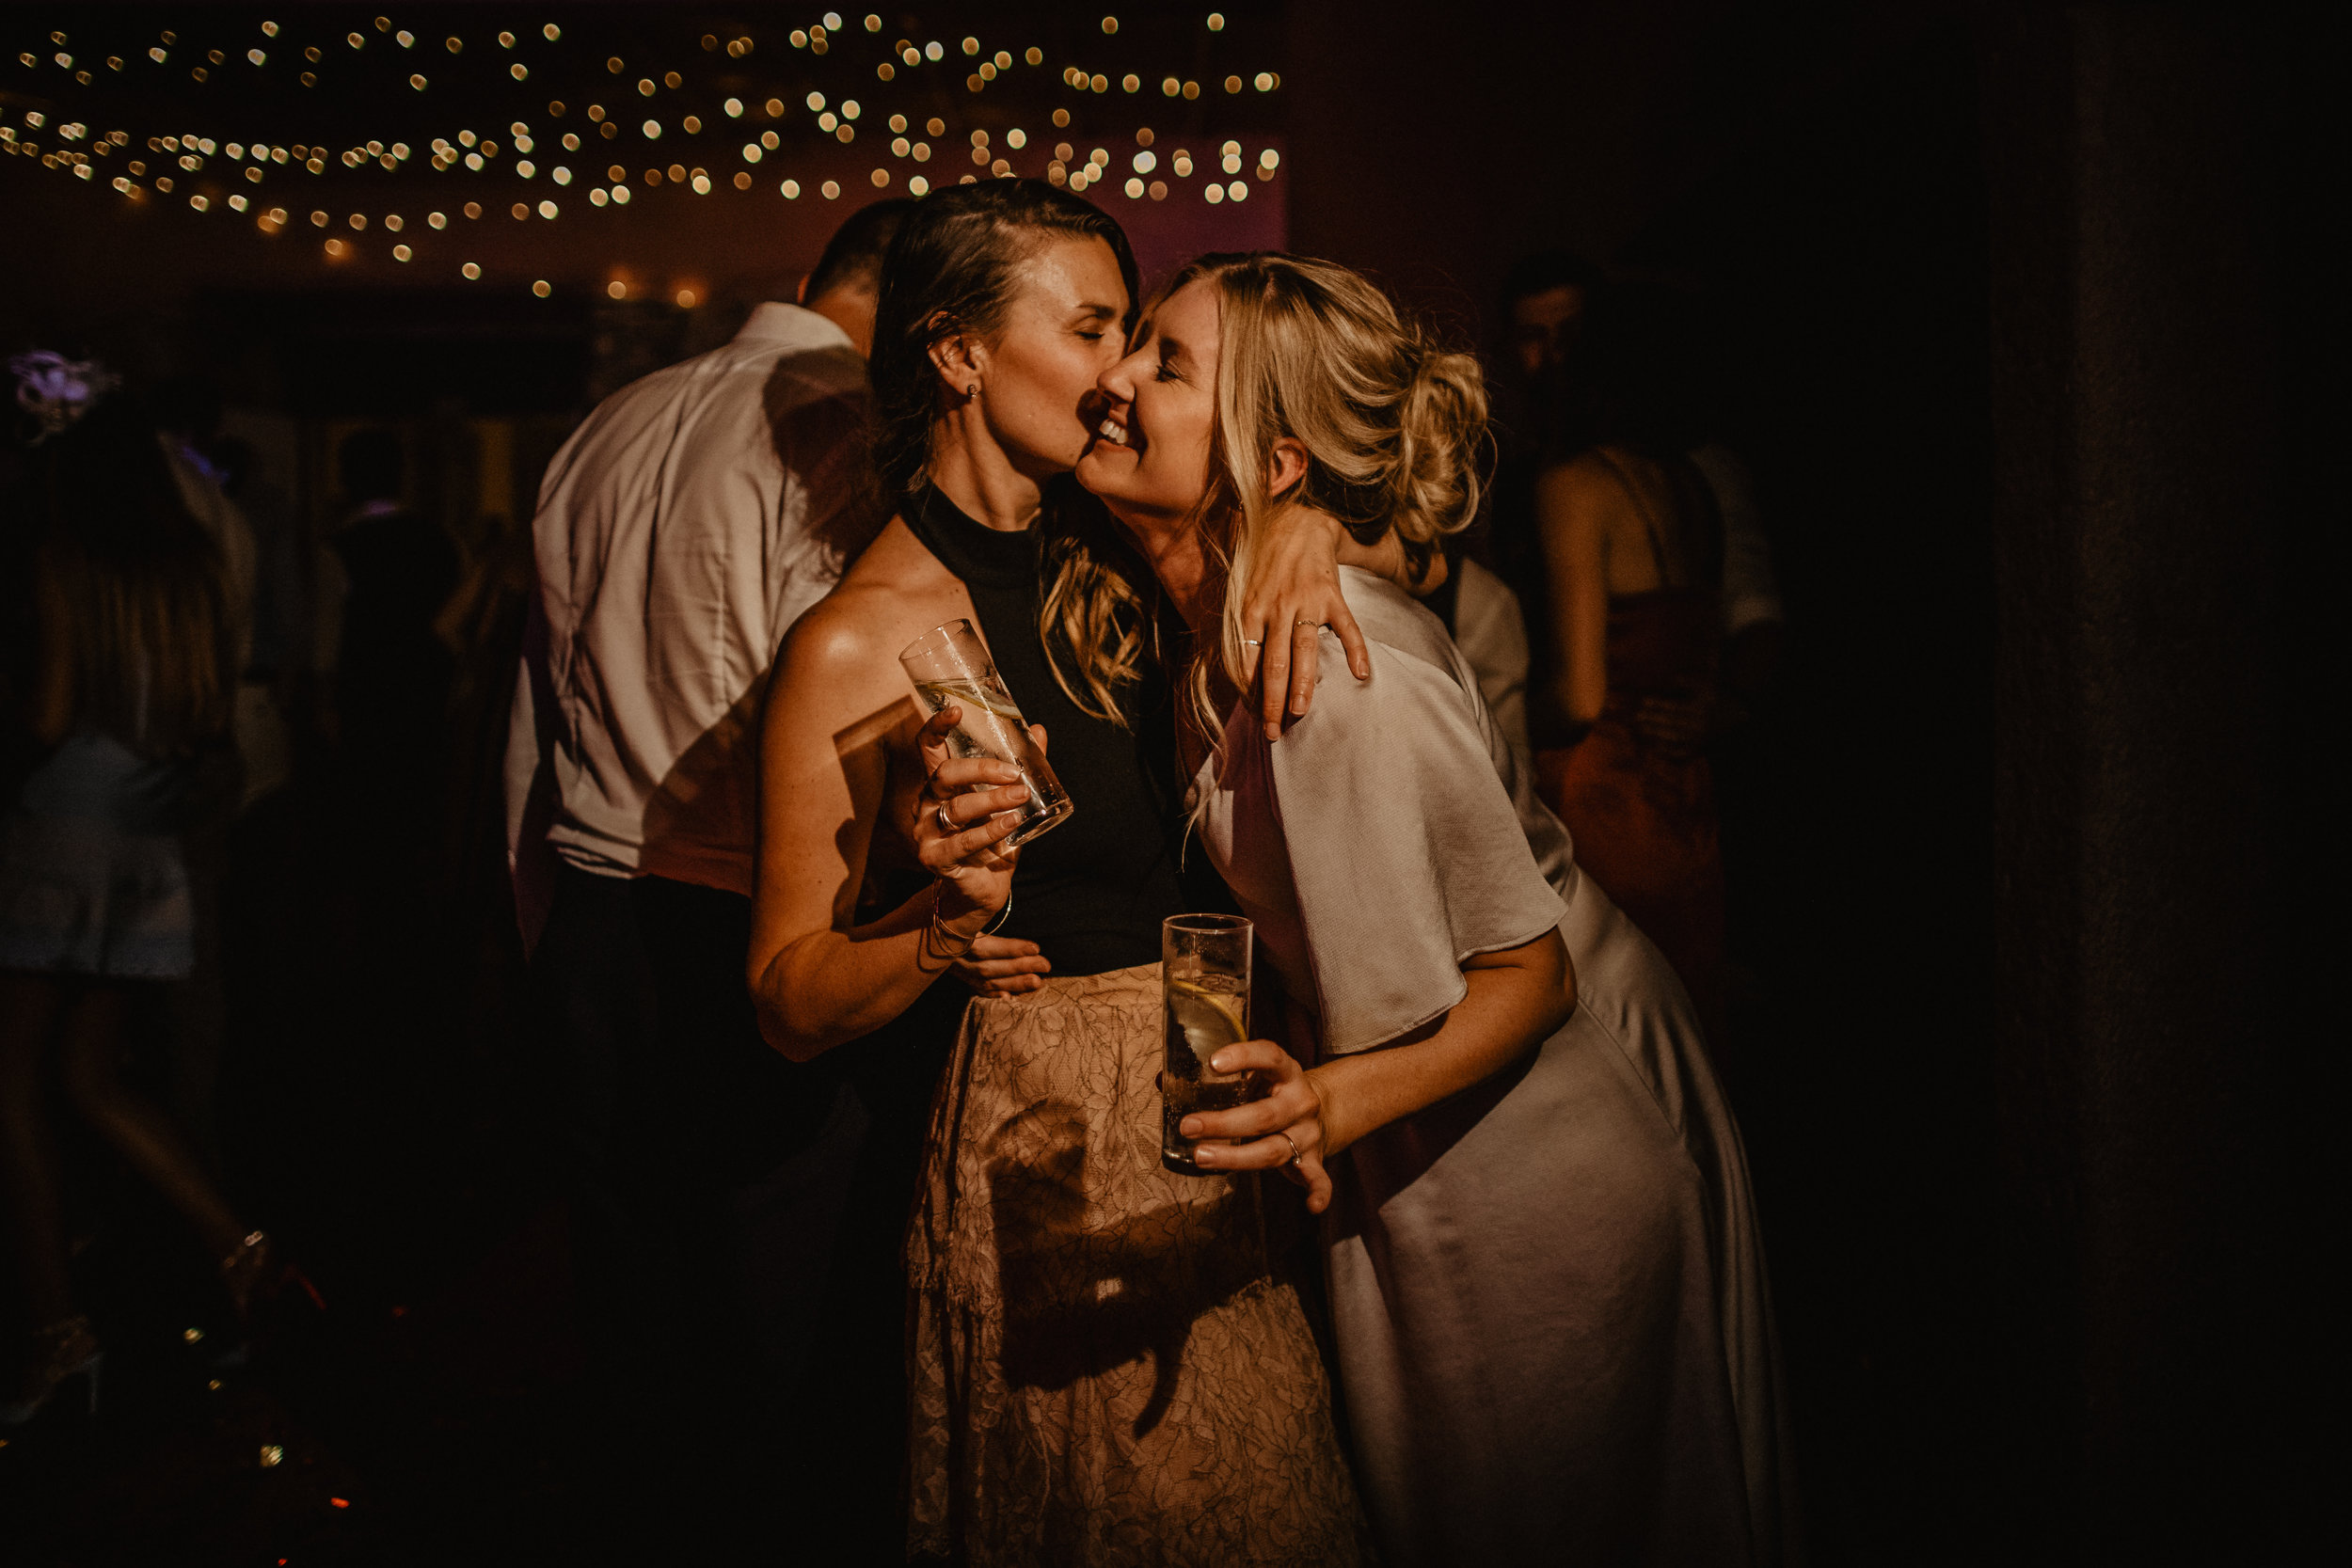 Lapela-photography-wedding-sintra-portugal-139.jpg